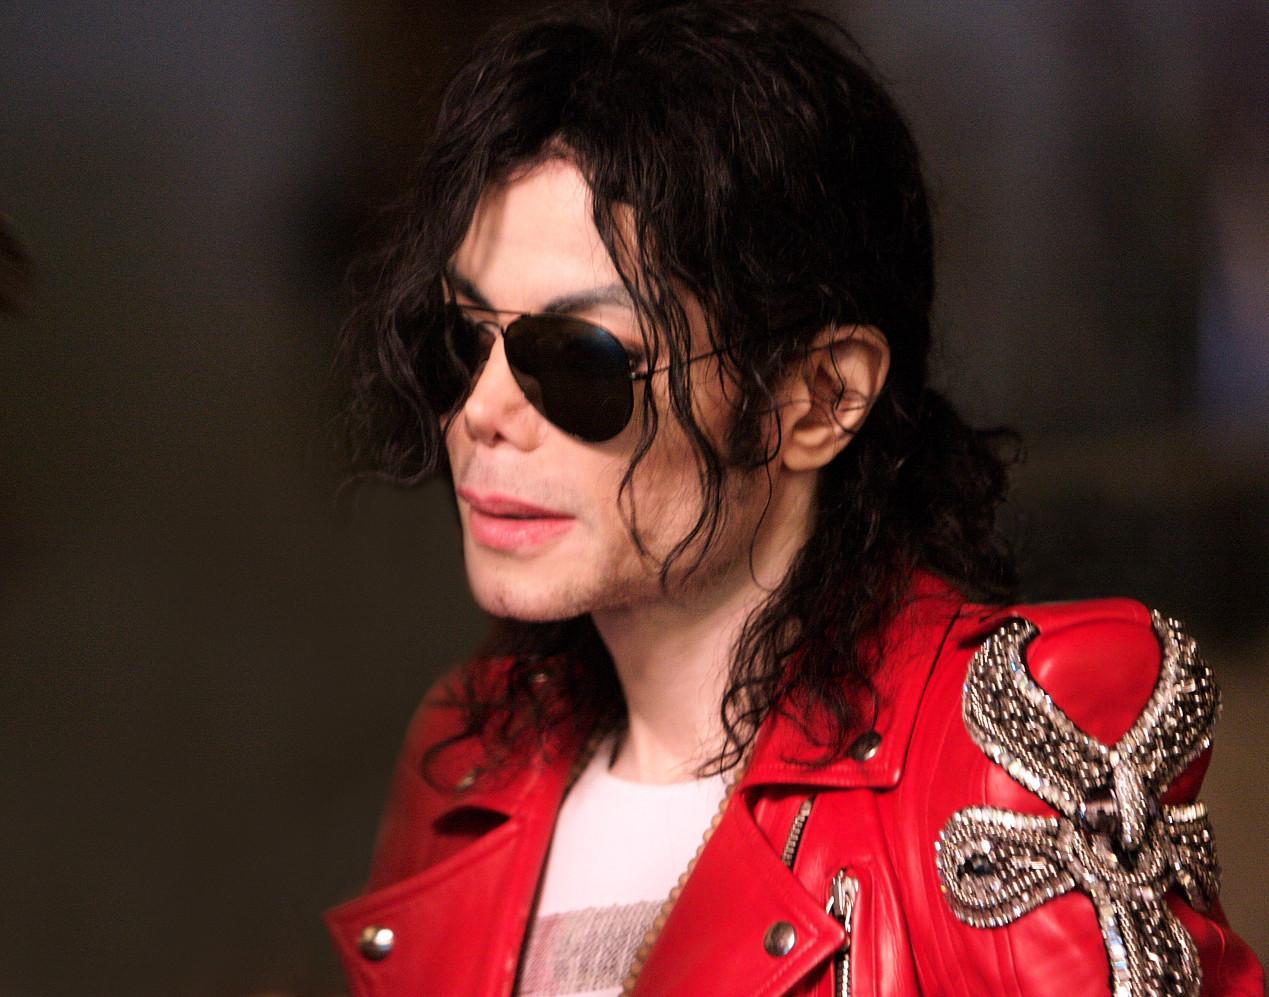 Майкл джексон самое красивое